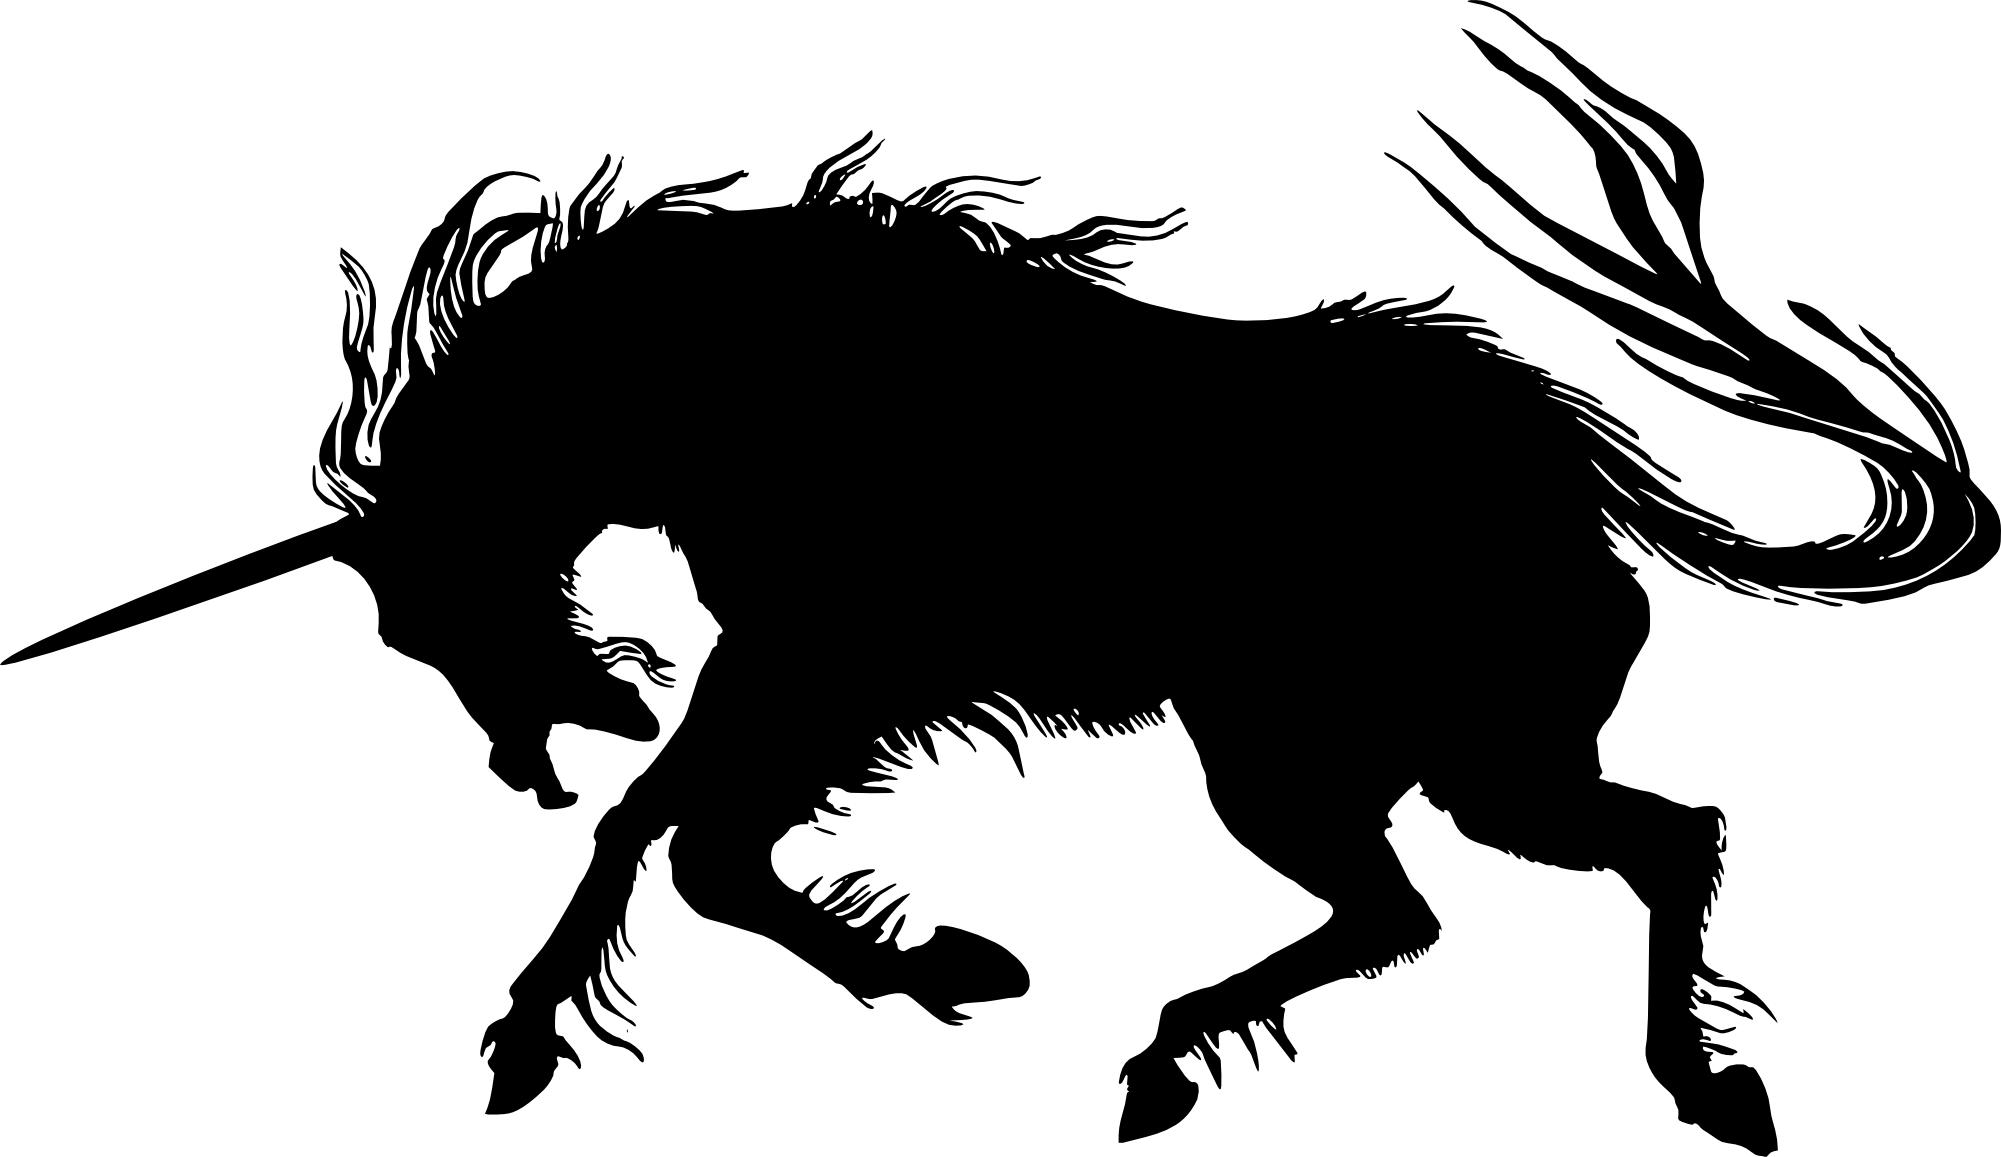 Shadow clipart unicorn #6